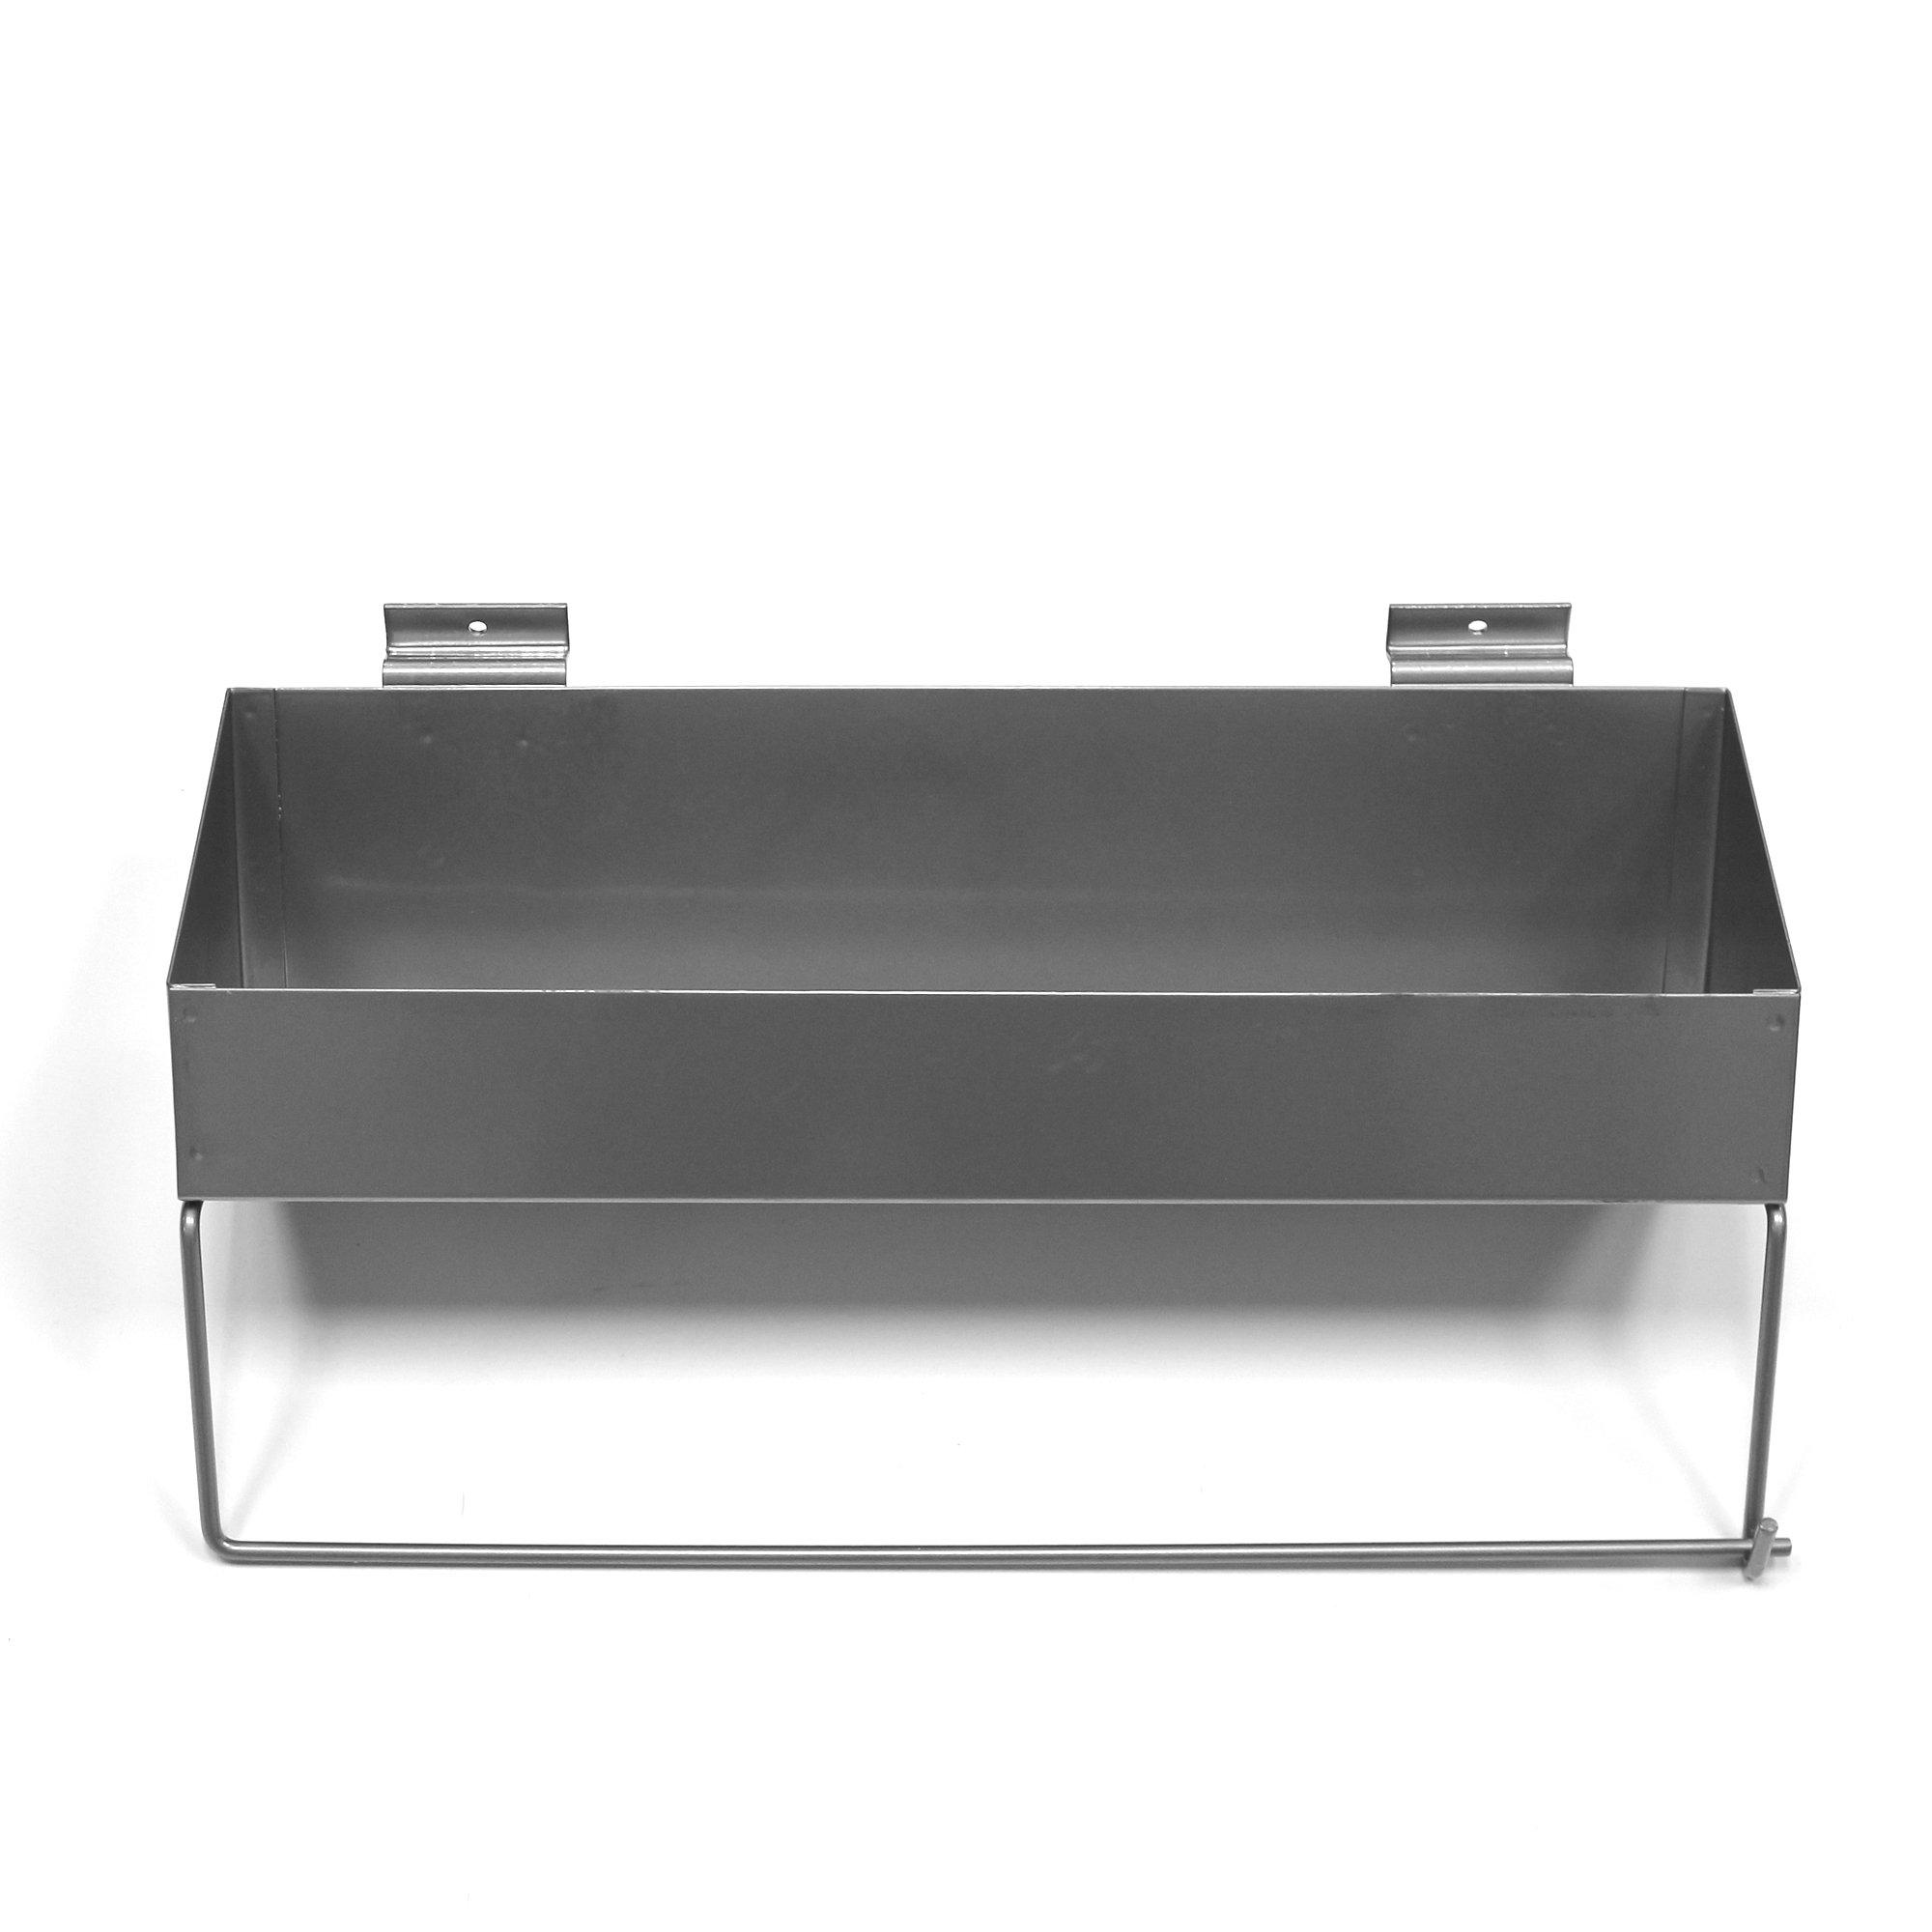 Proslat 10029 Paper Towel Holder Shelf Designed for Proslat PVC Slatwall by Proslat